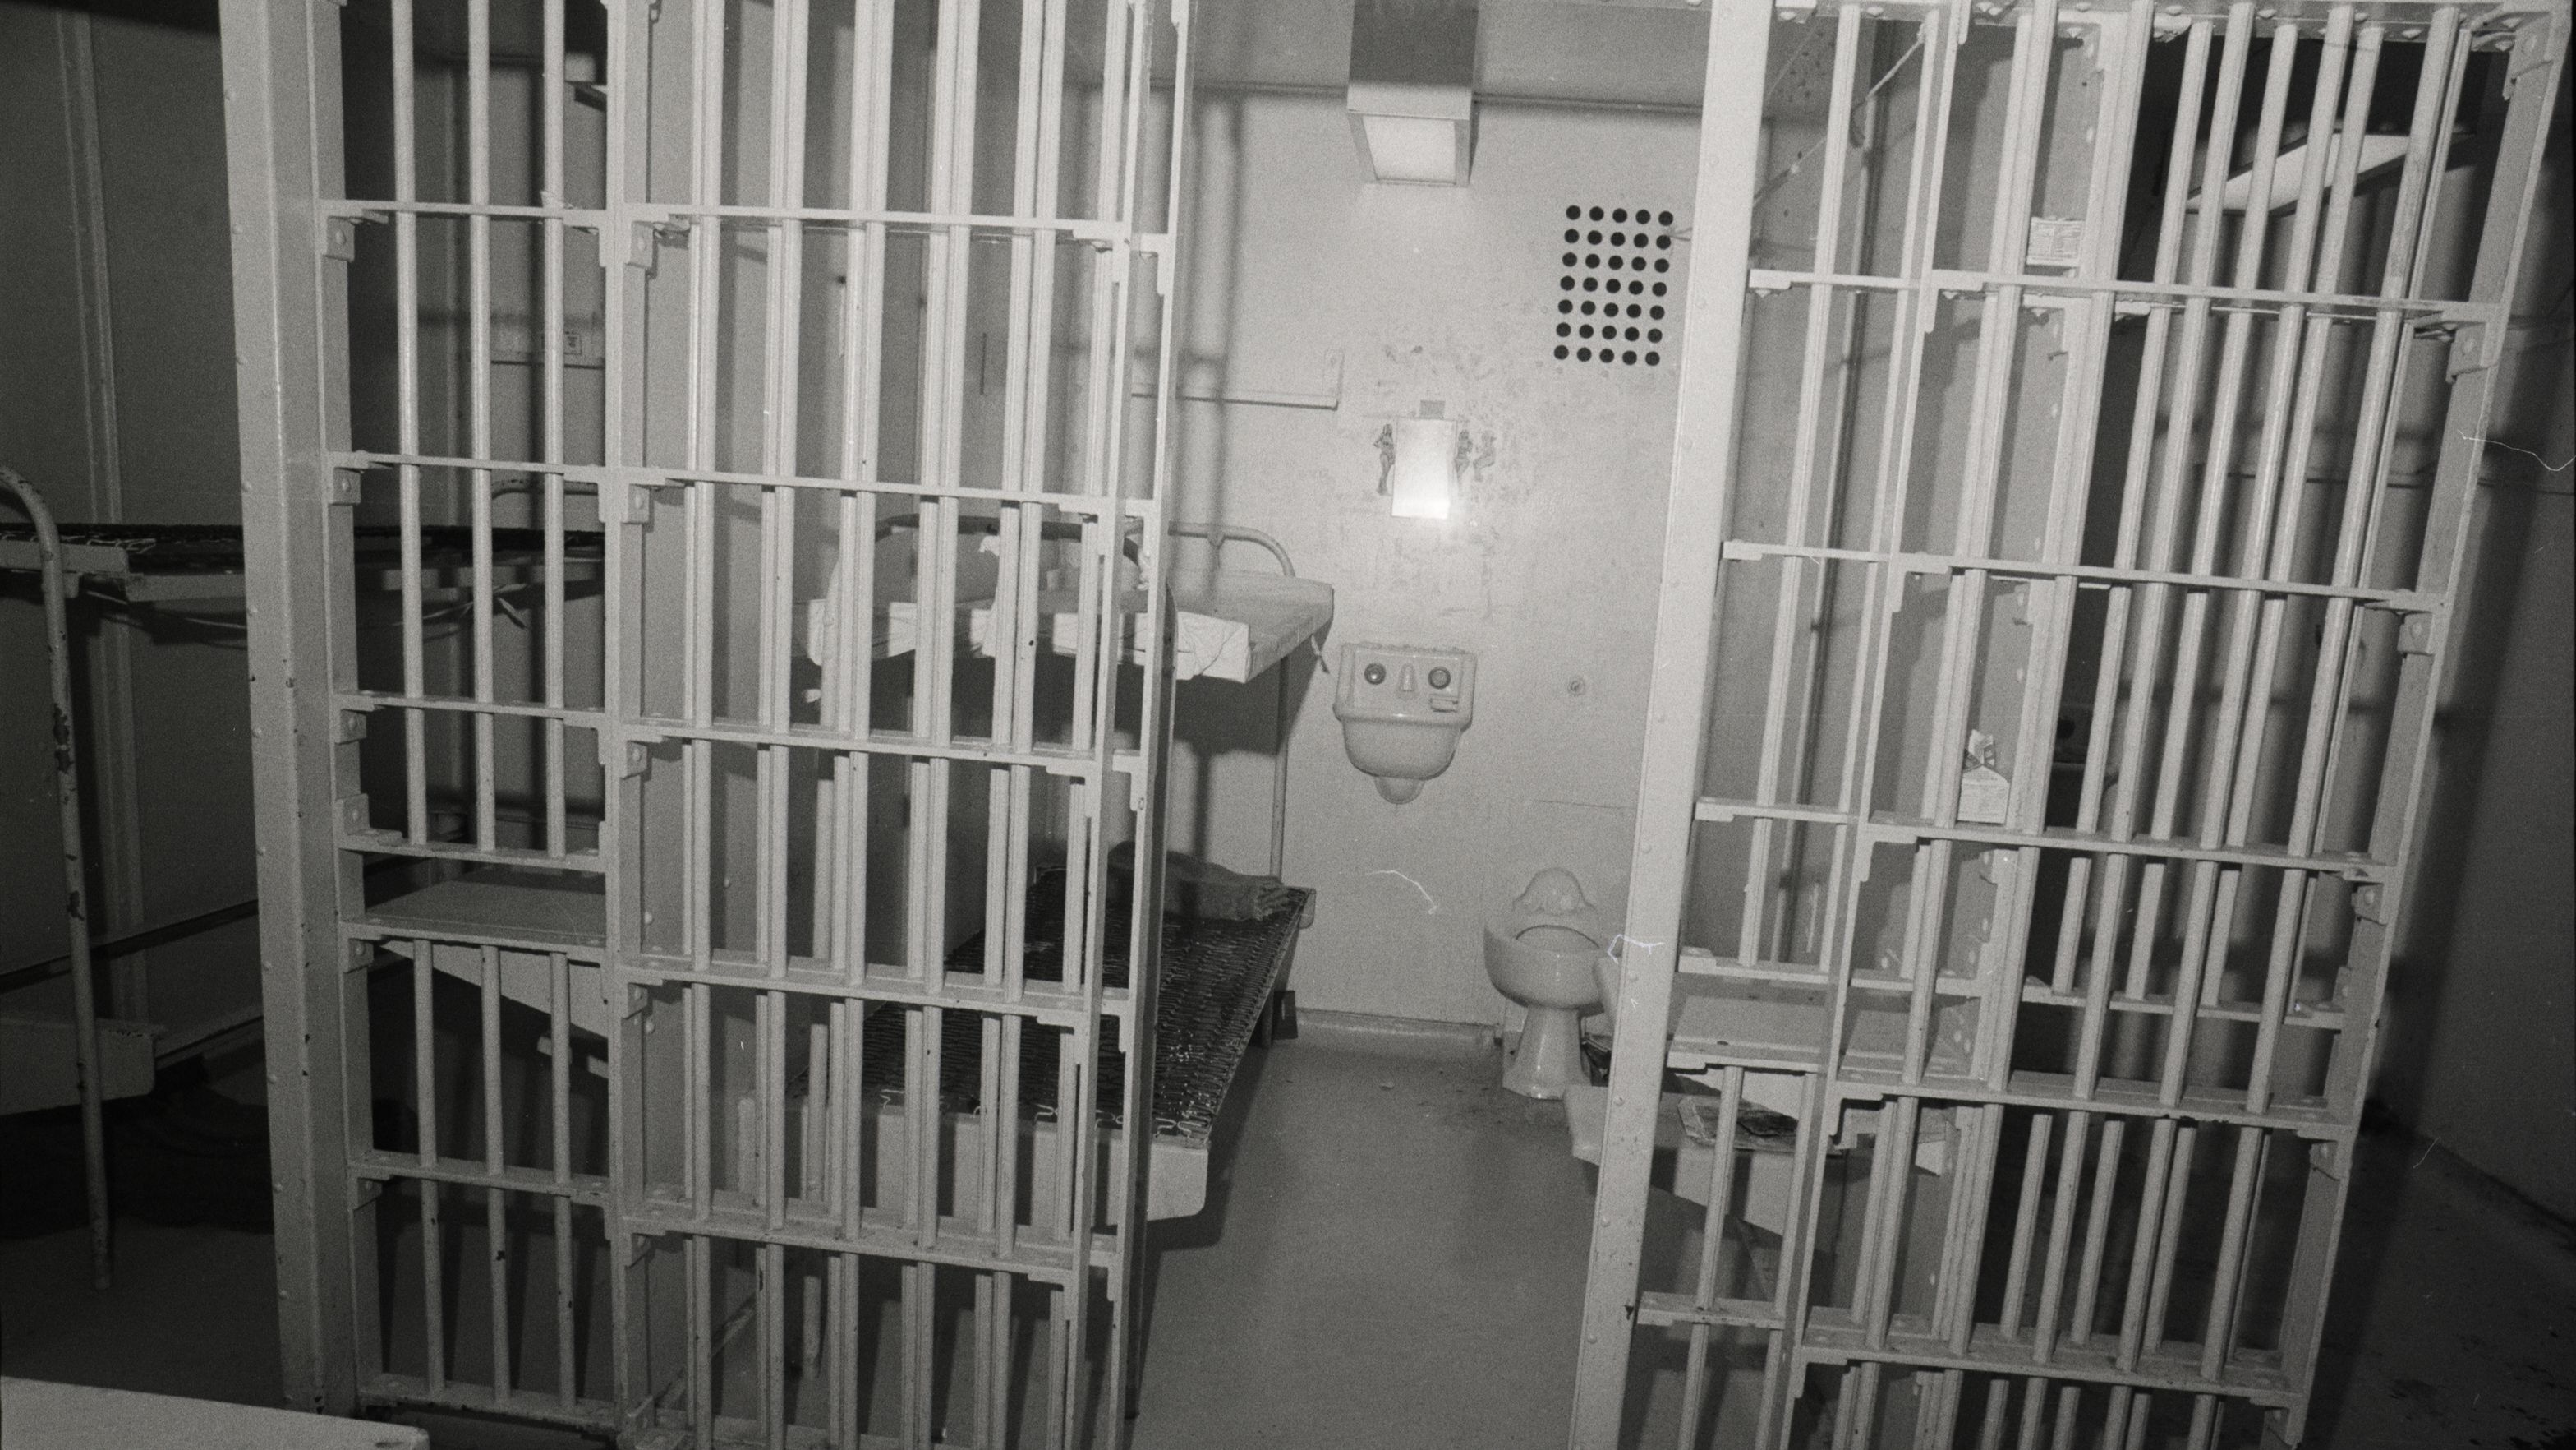 'Gladiator School': Inside the notorious prison holding Harvey Weinstein